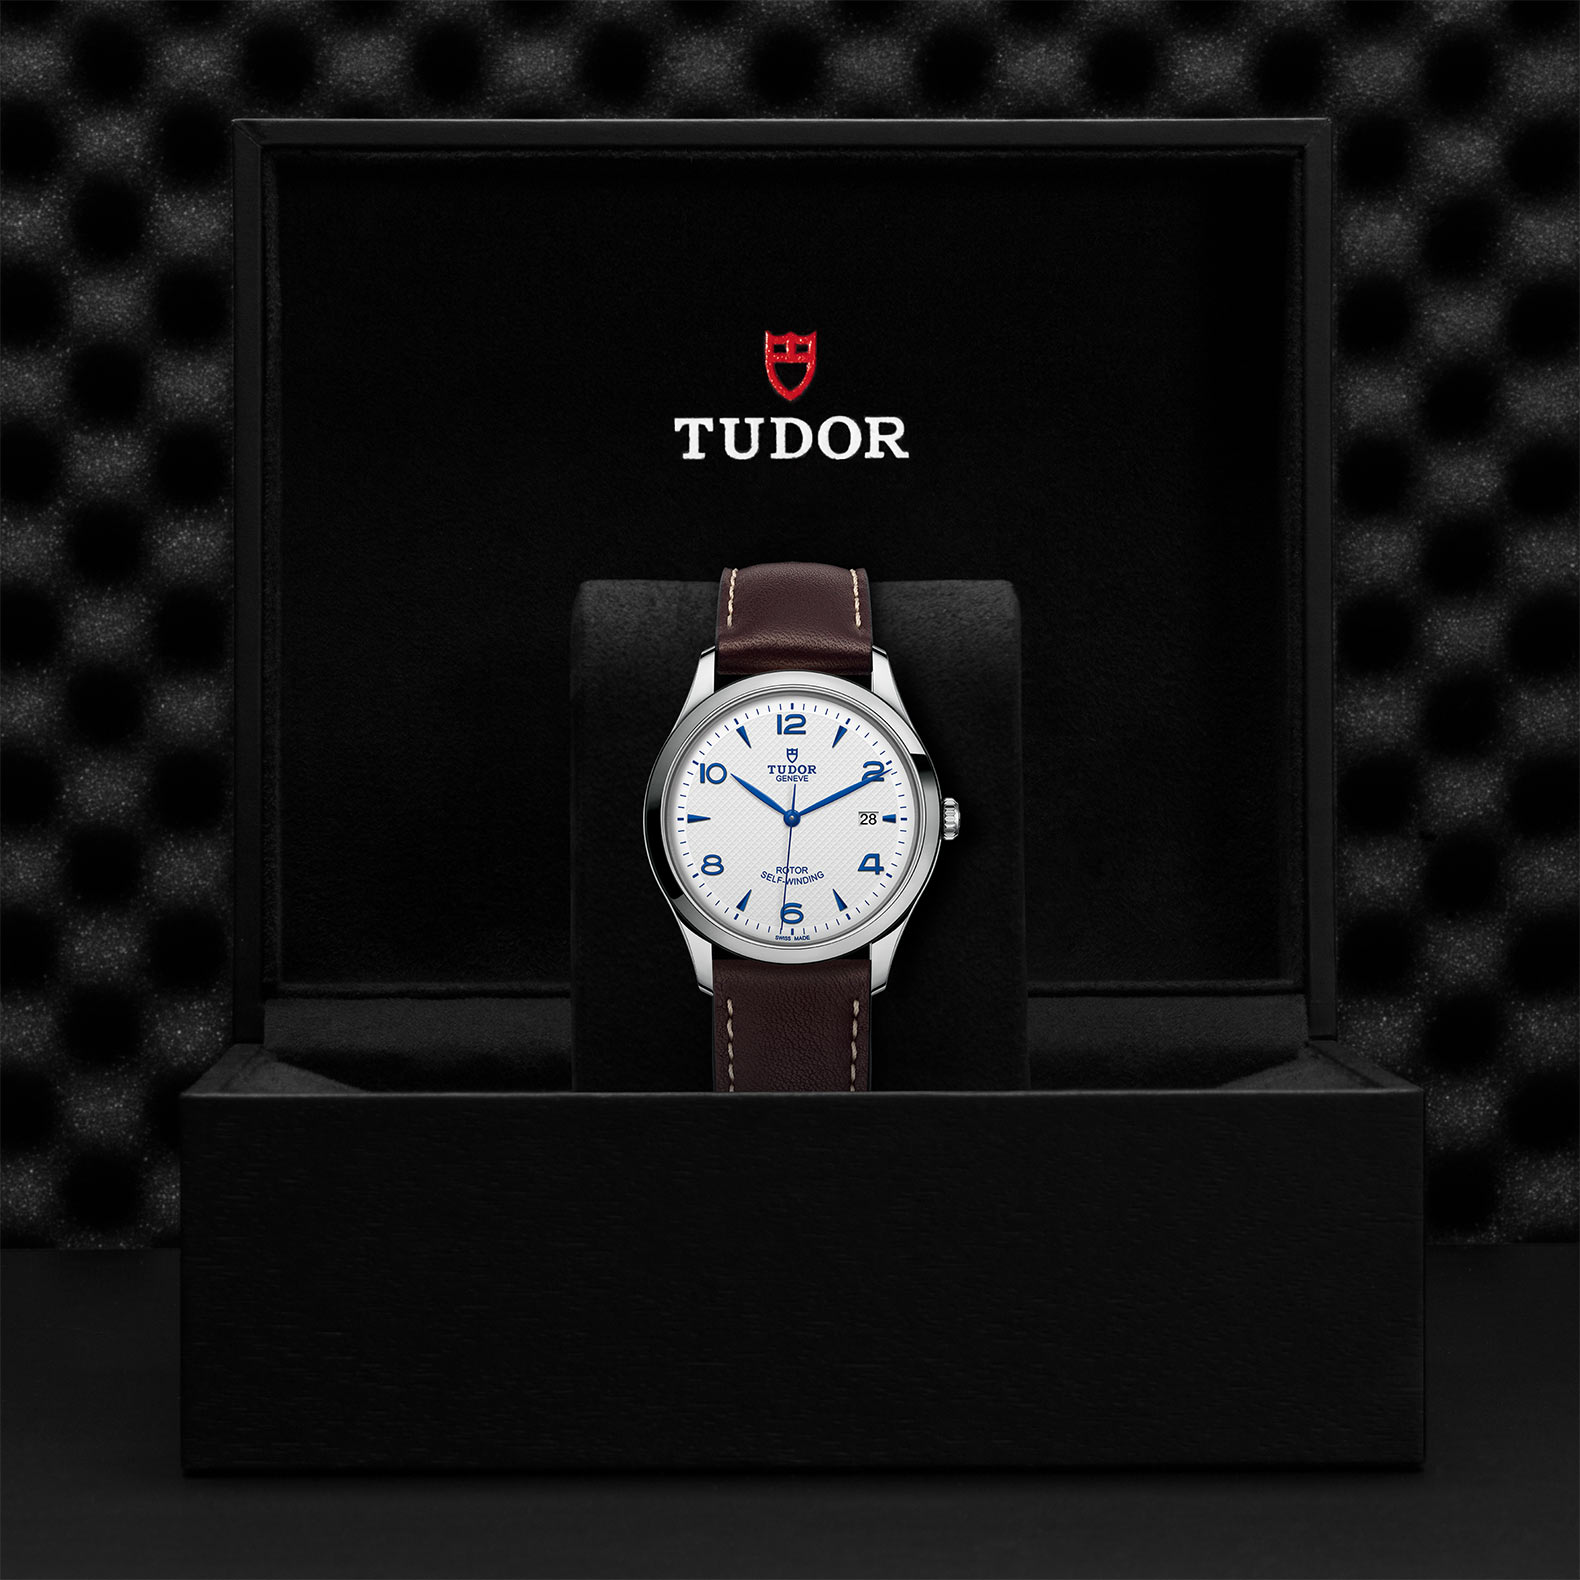 TUDOR 1926 - M91650-0010